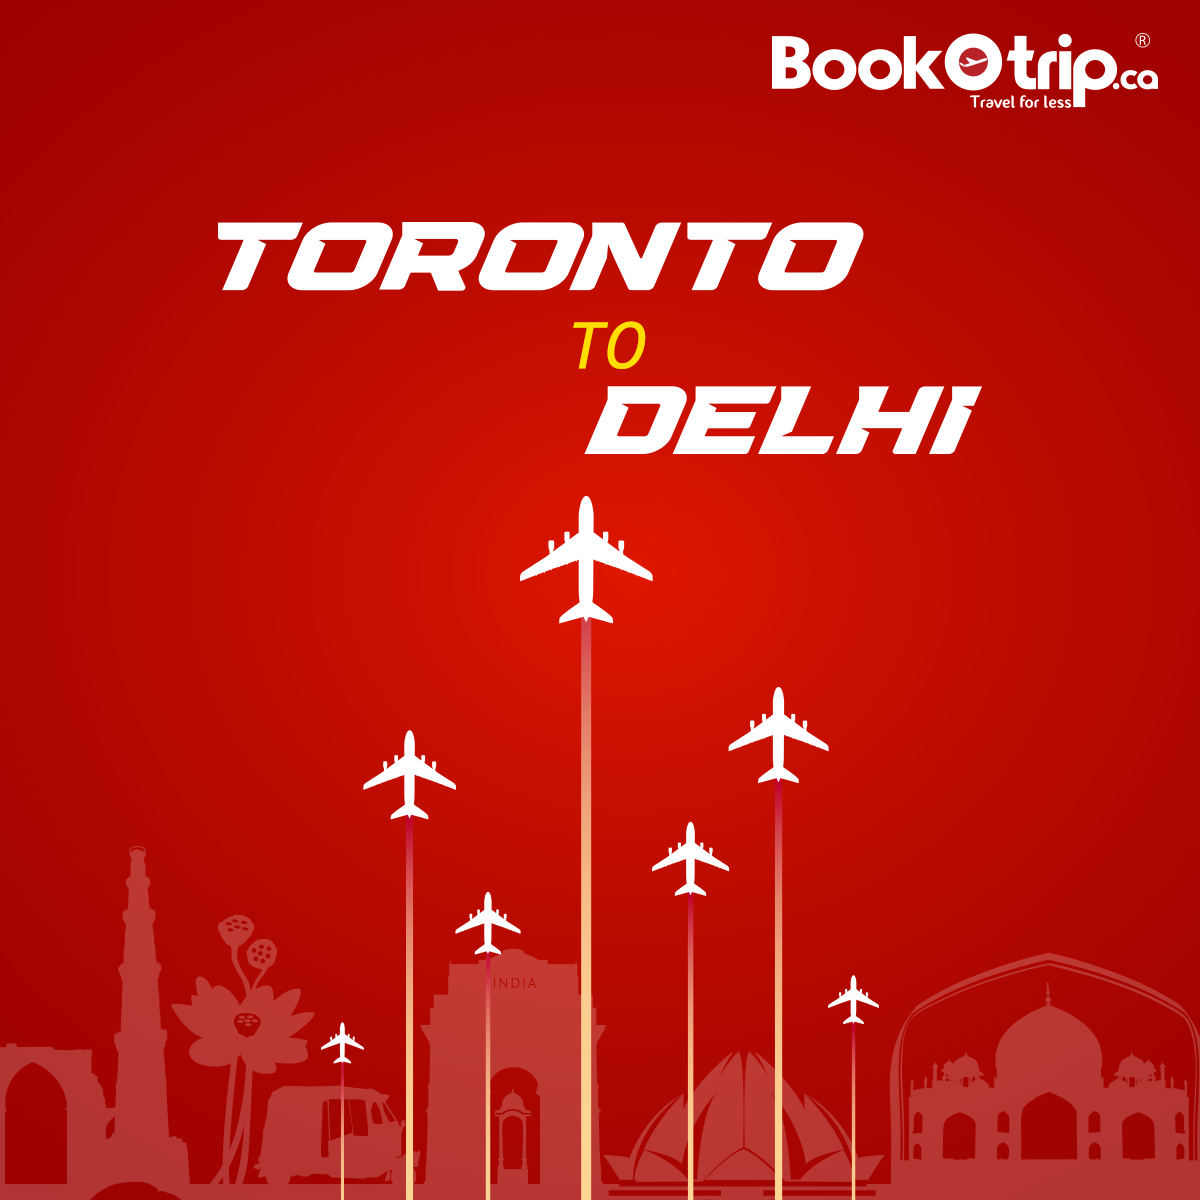 Toronto To Delhi Book airline tickets, Book cheap